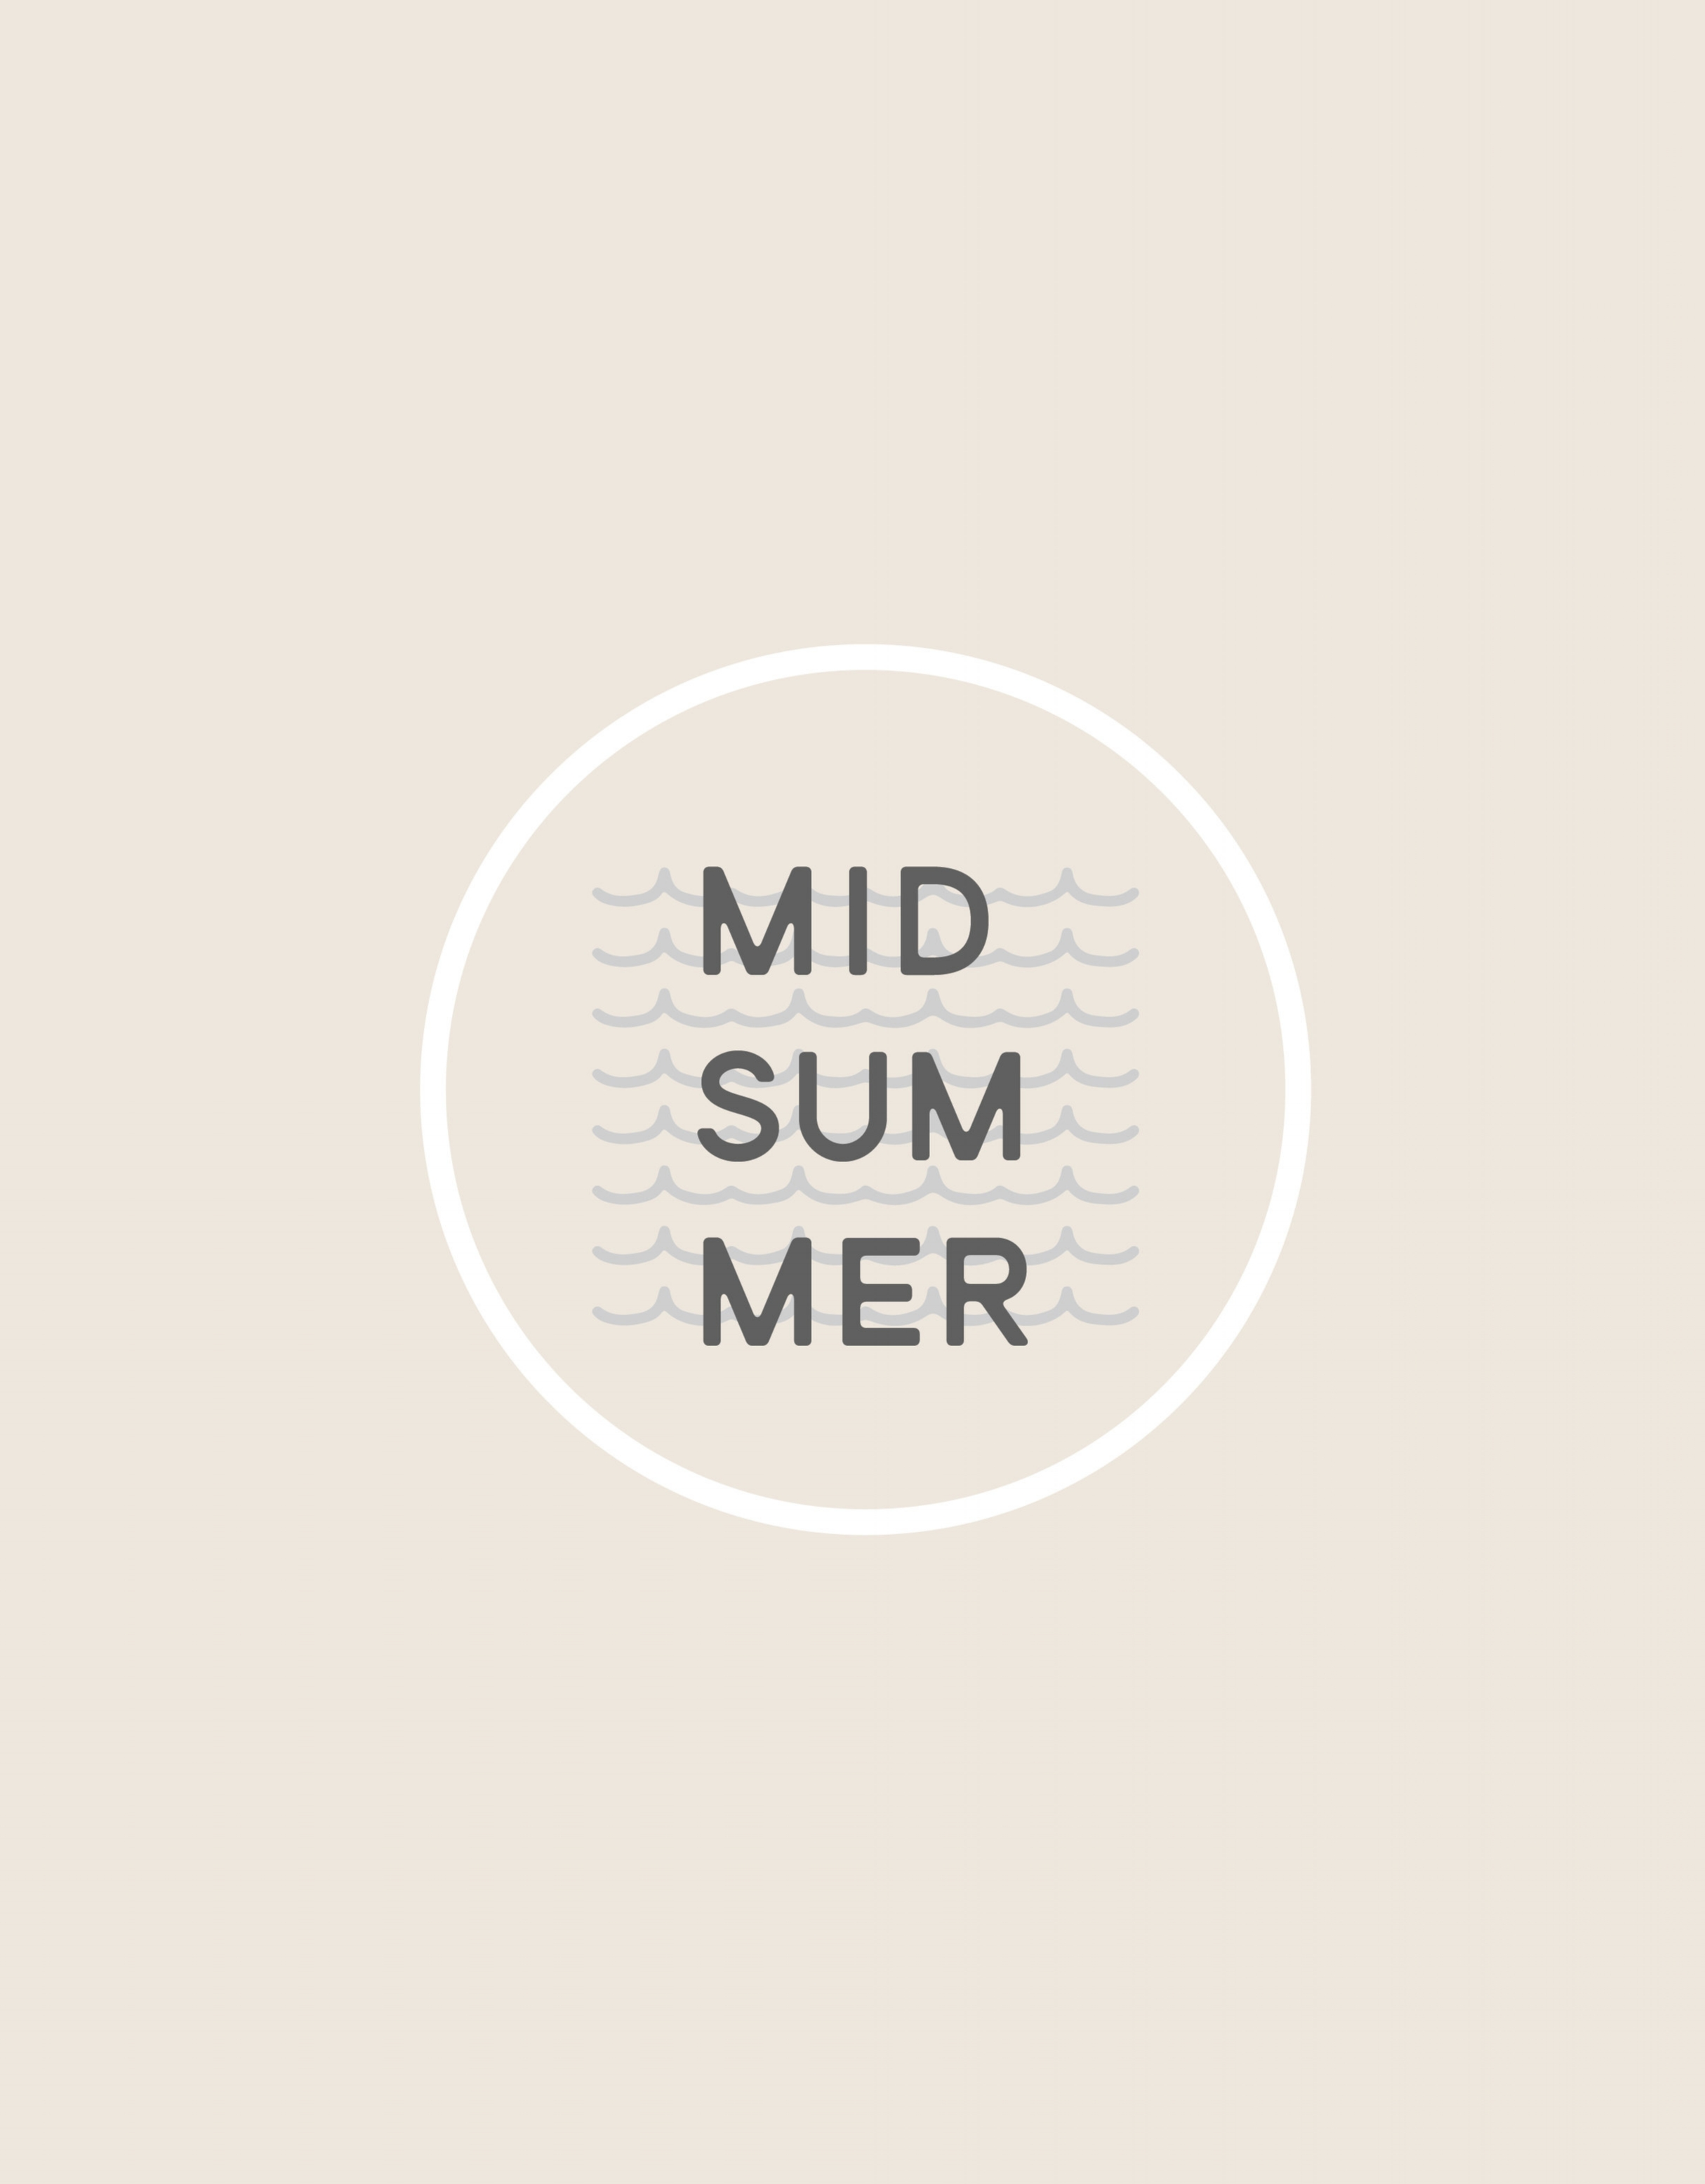 Wendling_Boyd_Midsummer_Resolution_Blog_Post_Graphic.jpg